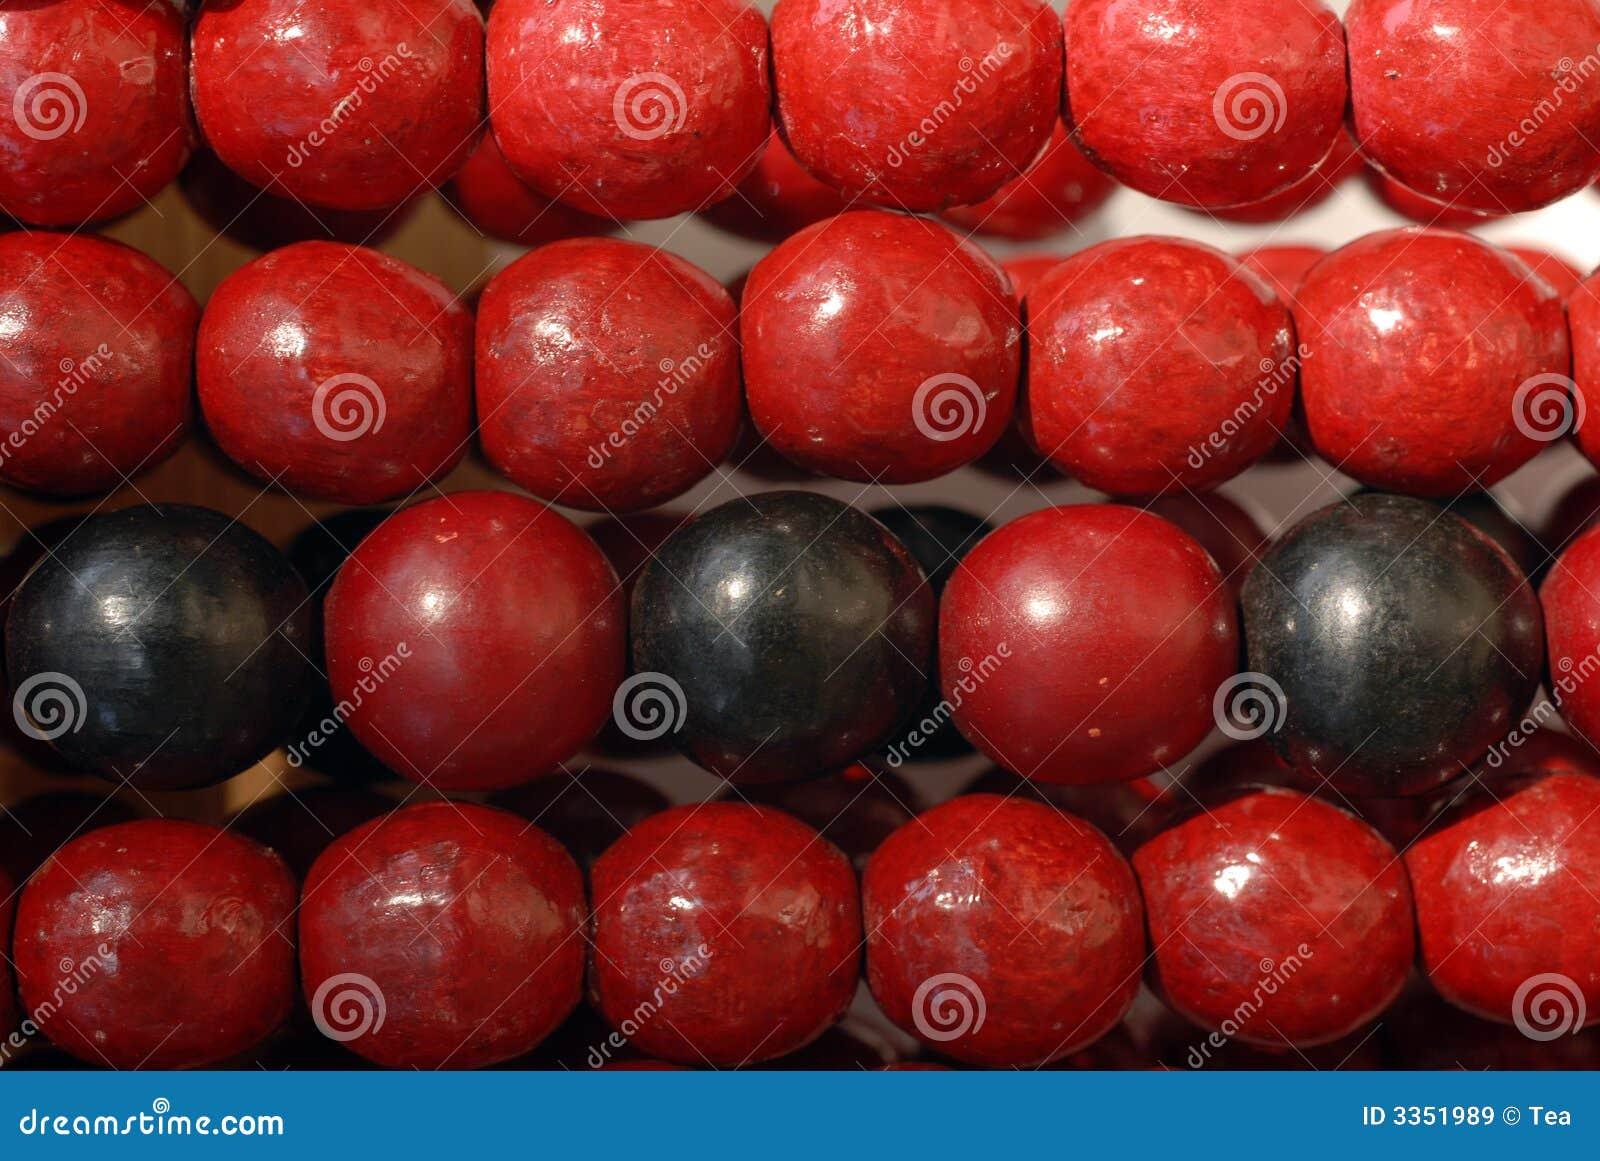 Grânulos vermelhos